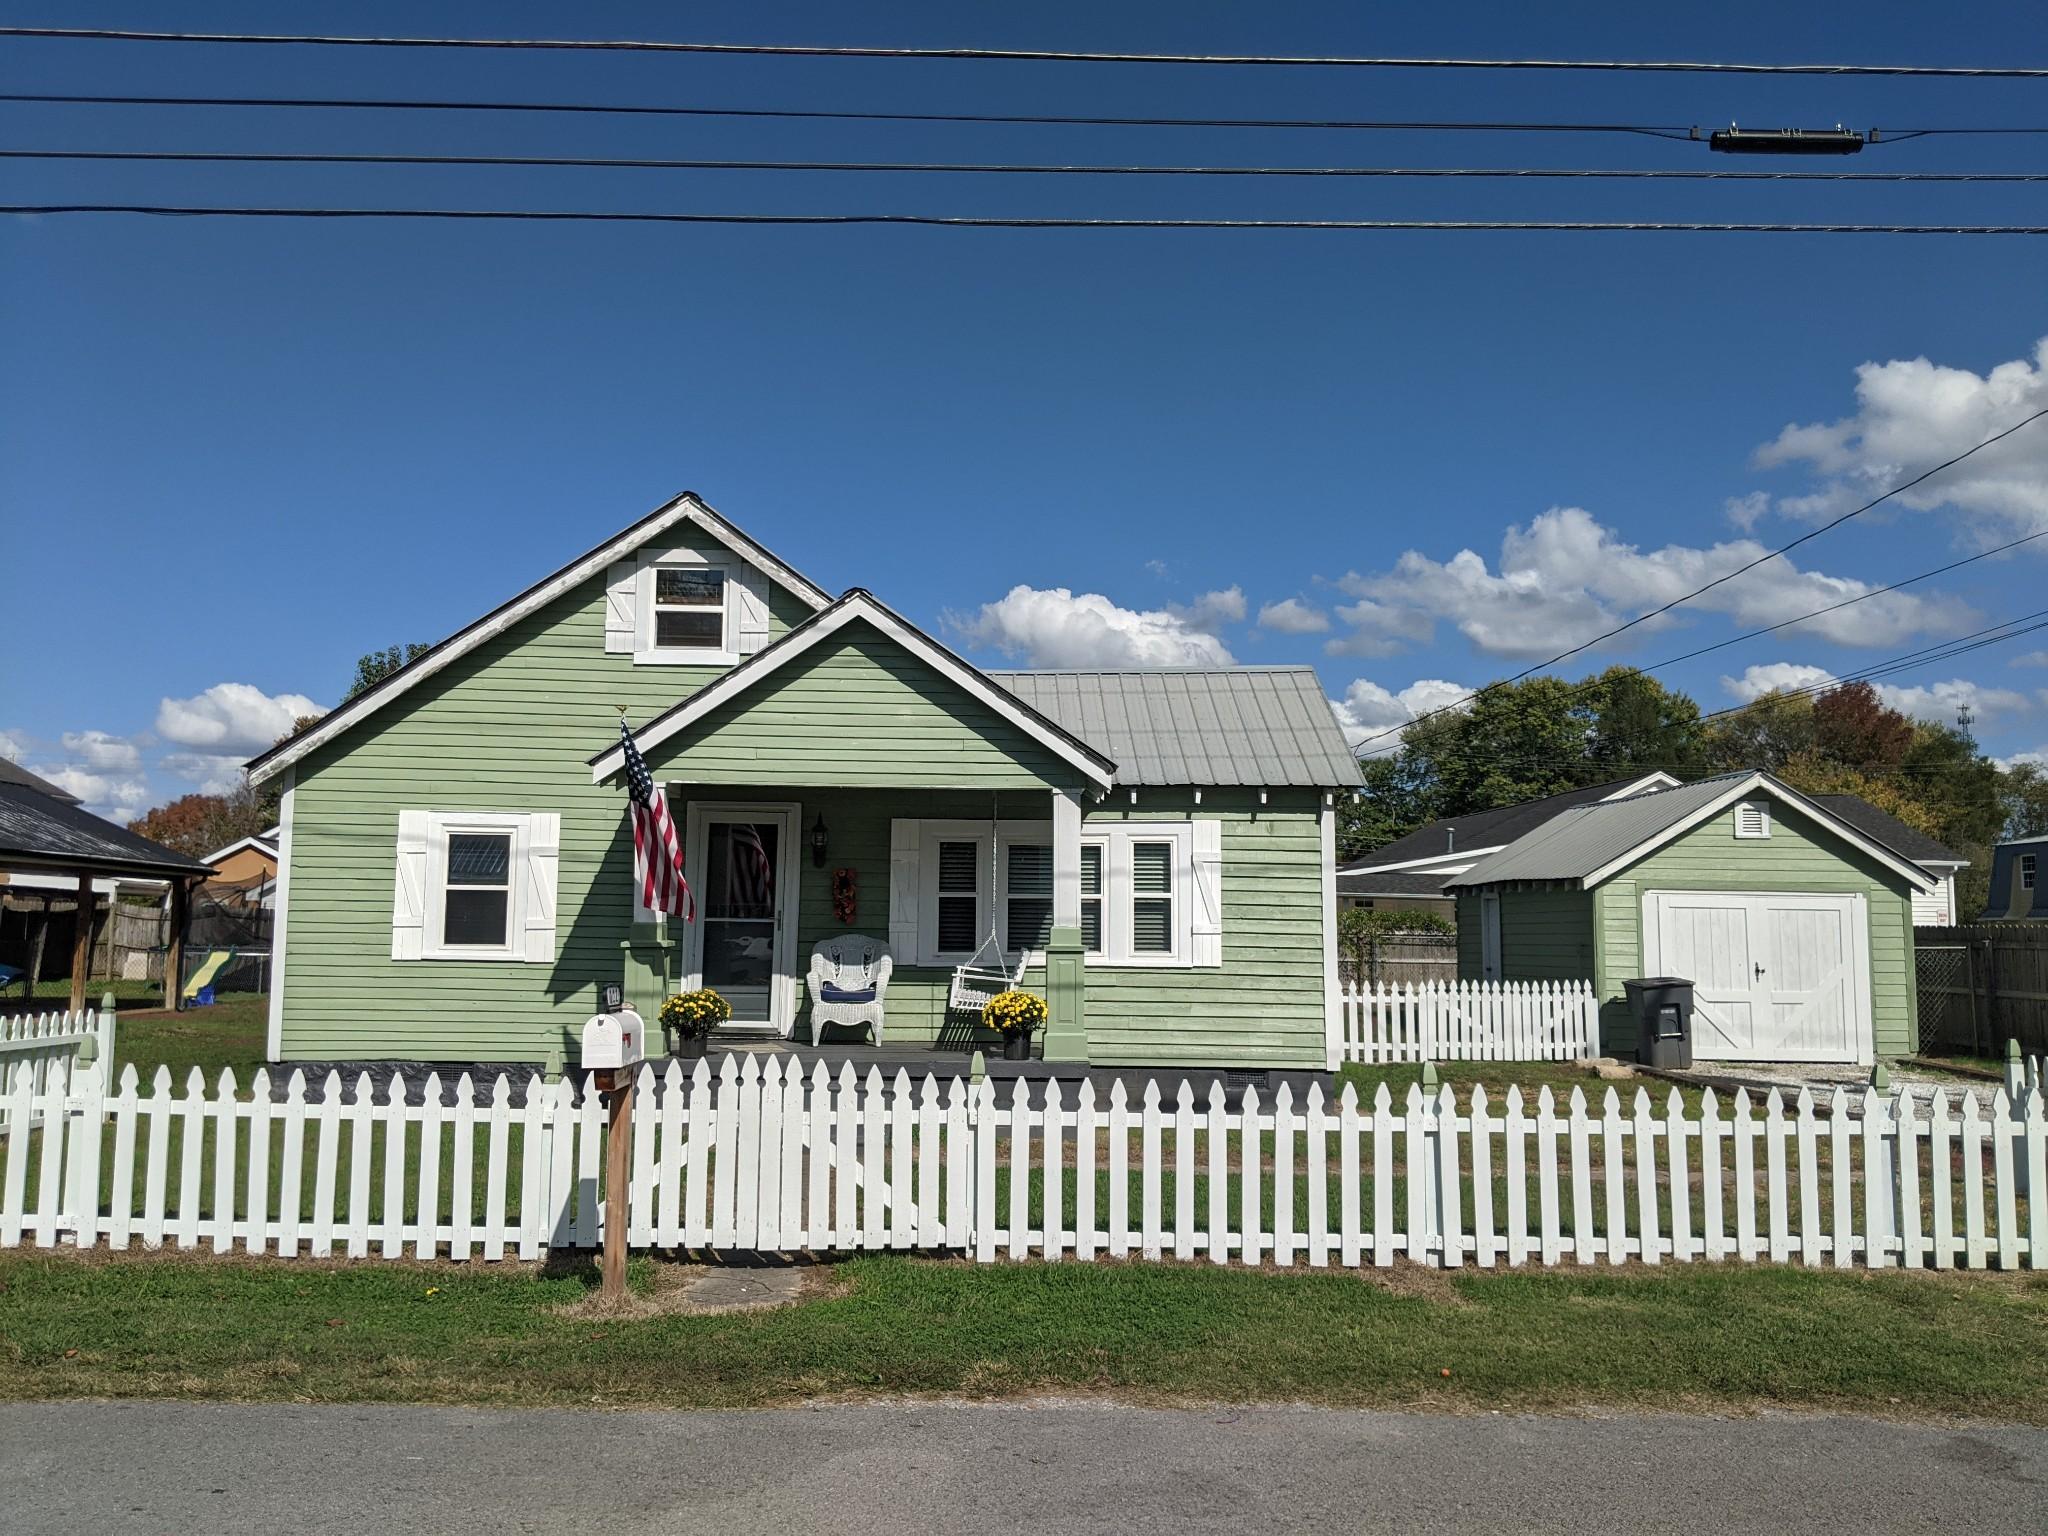 122 Woodland Dr Property Photo - Mc Minnville, TN real estate listing